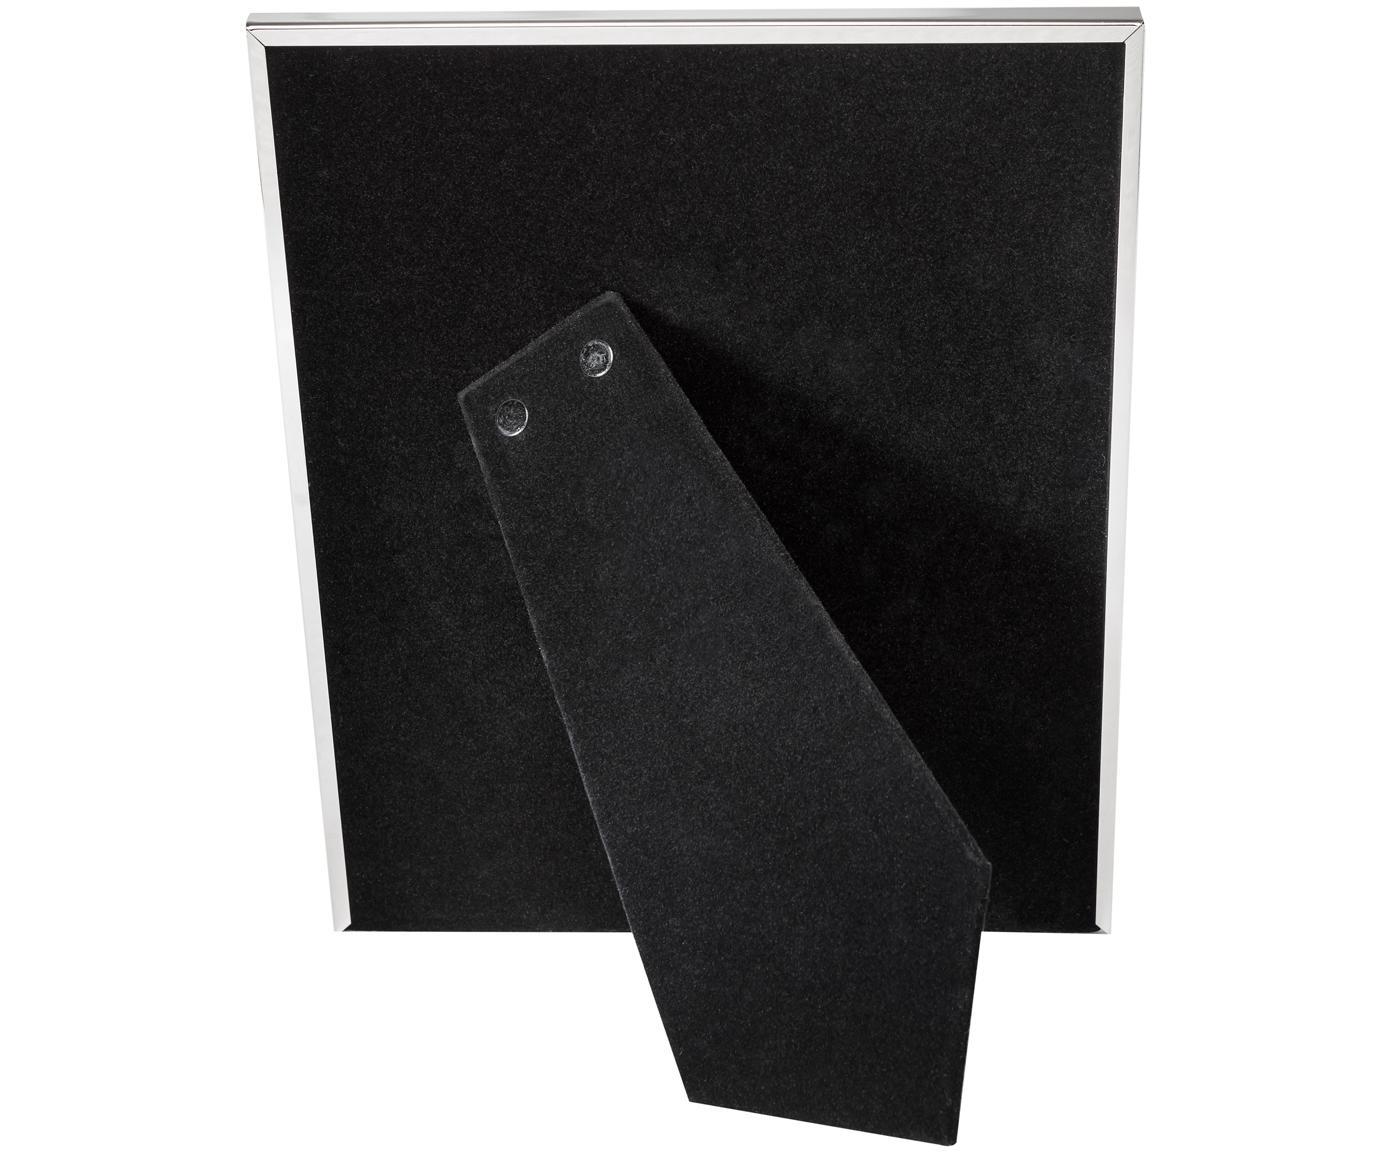 Ramka na zdjęcia Memento, Srebrny, 10 x 15 cm